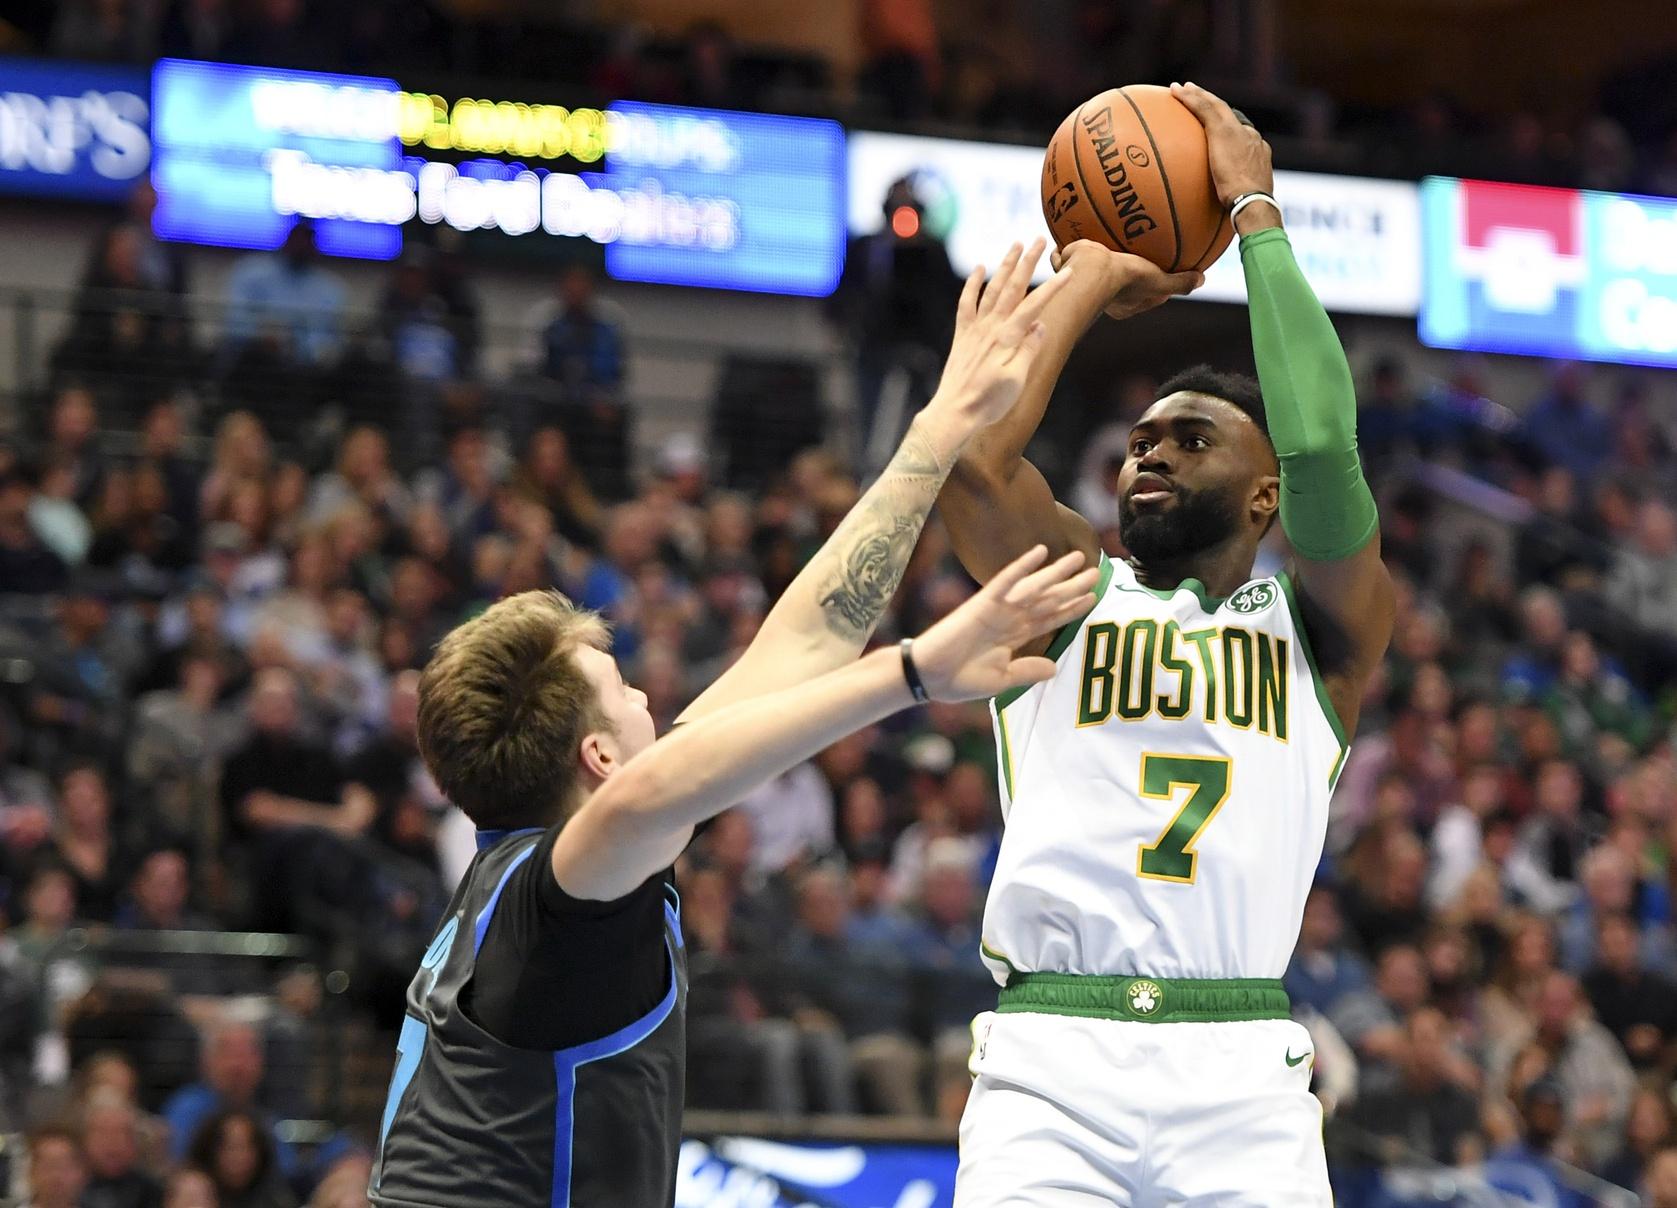 Boston Celtics injury report: Jaylen Brown is out vs. Pelicans